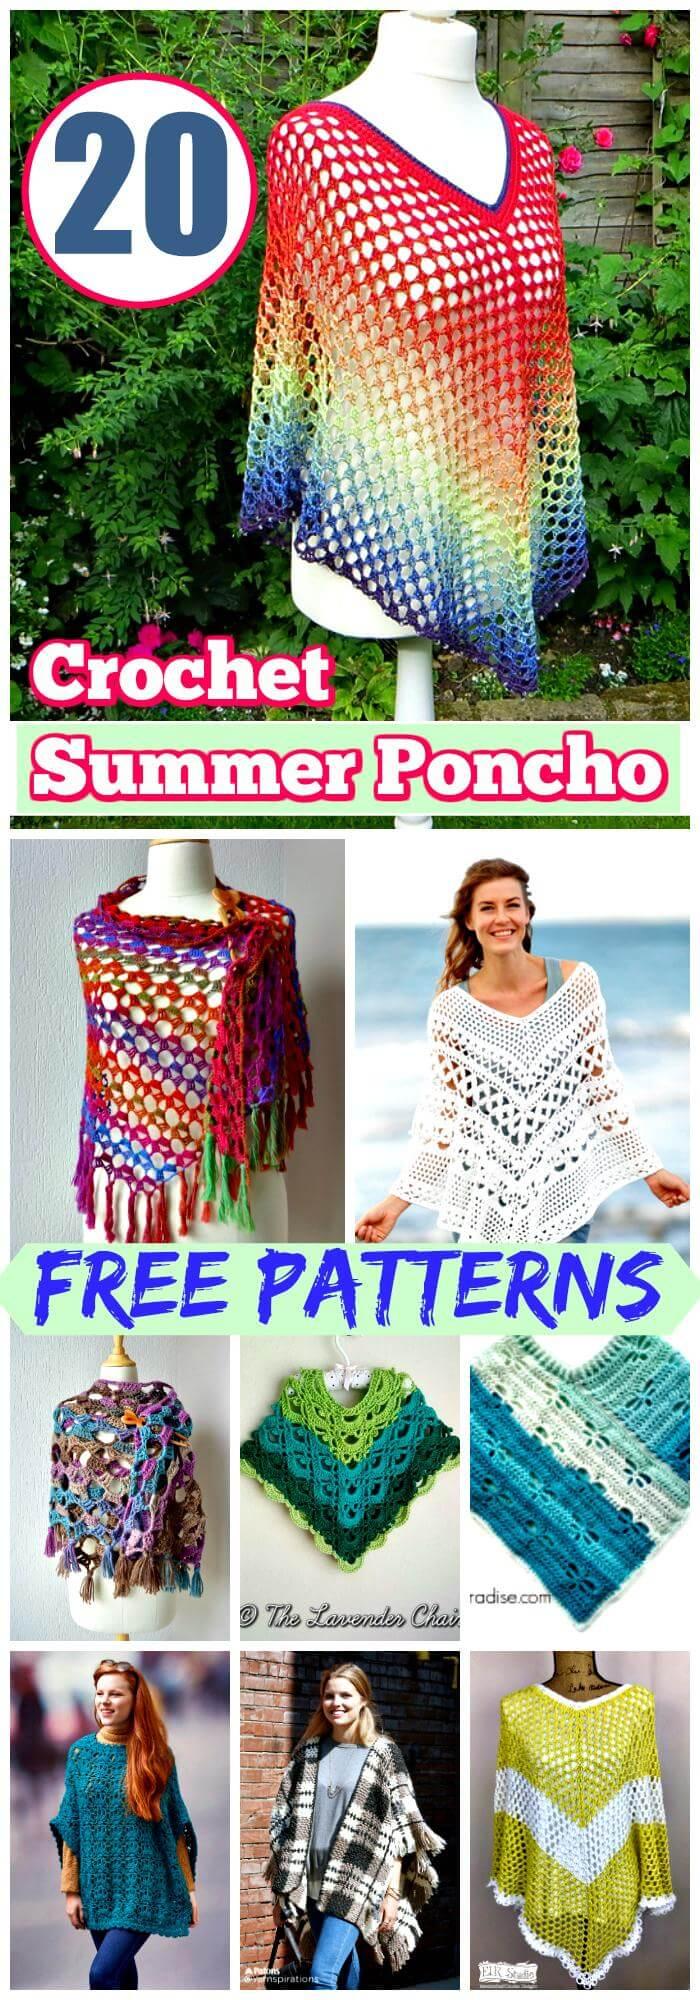 granny square poncho instructions